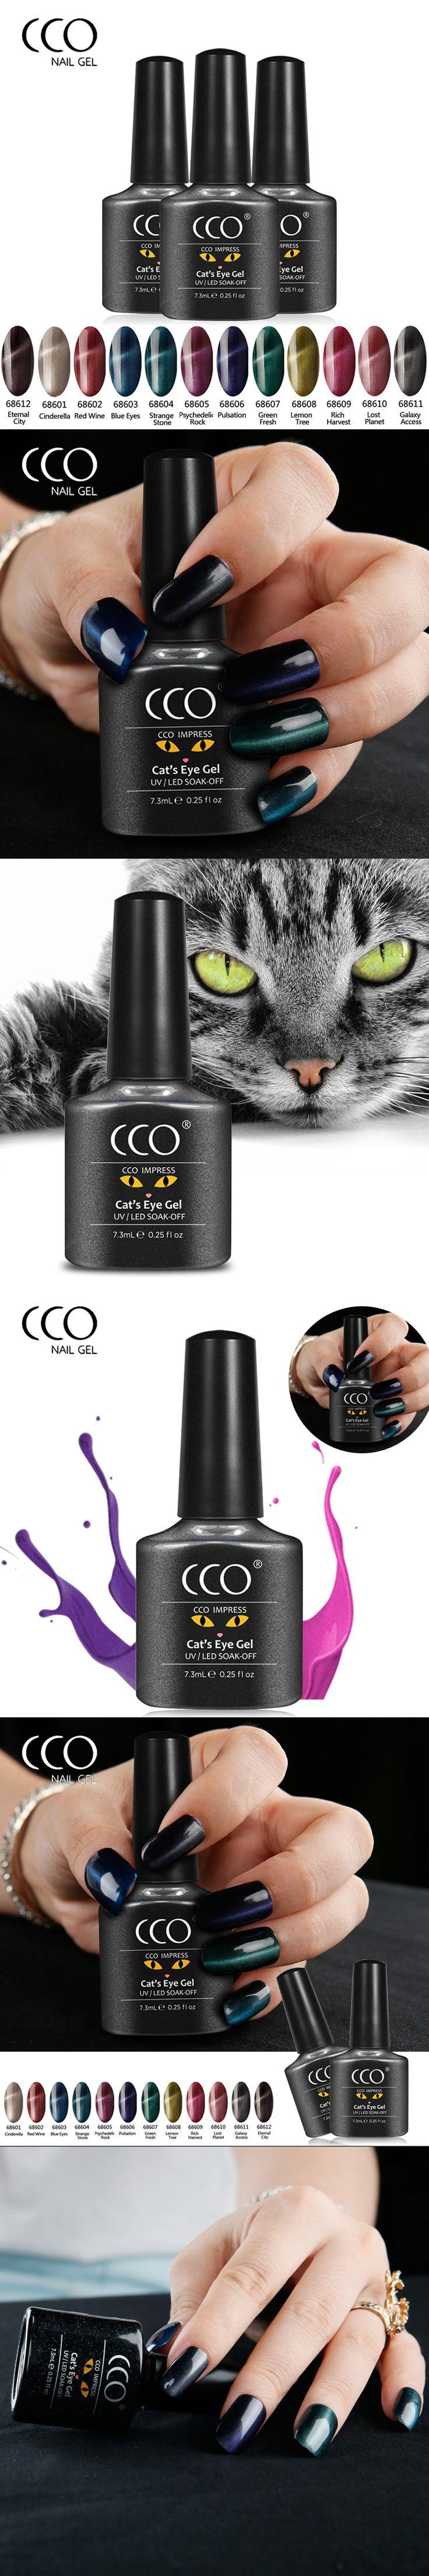 CCO Nail Gel Polish Varnish Elegant 3D Cat Eyes Gel Nail Polish Magnetic Gel Soak Off UV LED Gelpolish Nail Art For Women Beauty